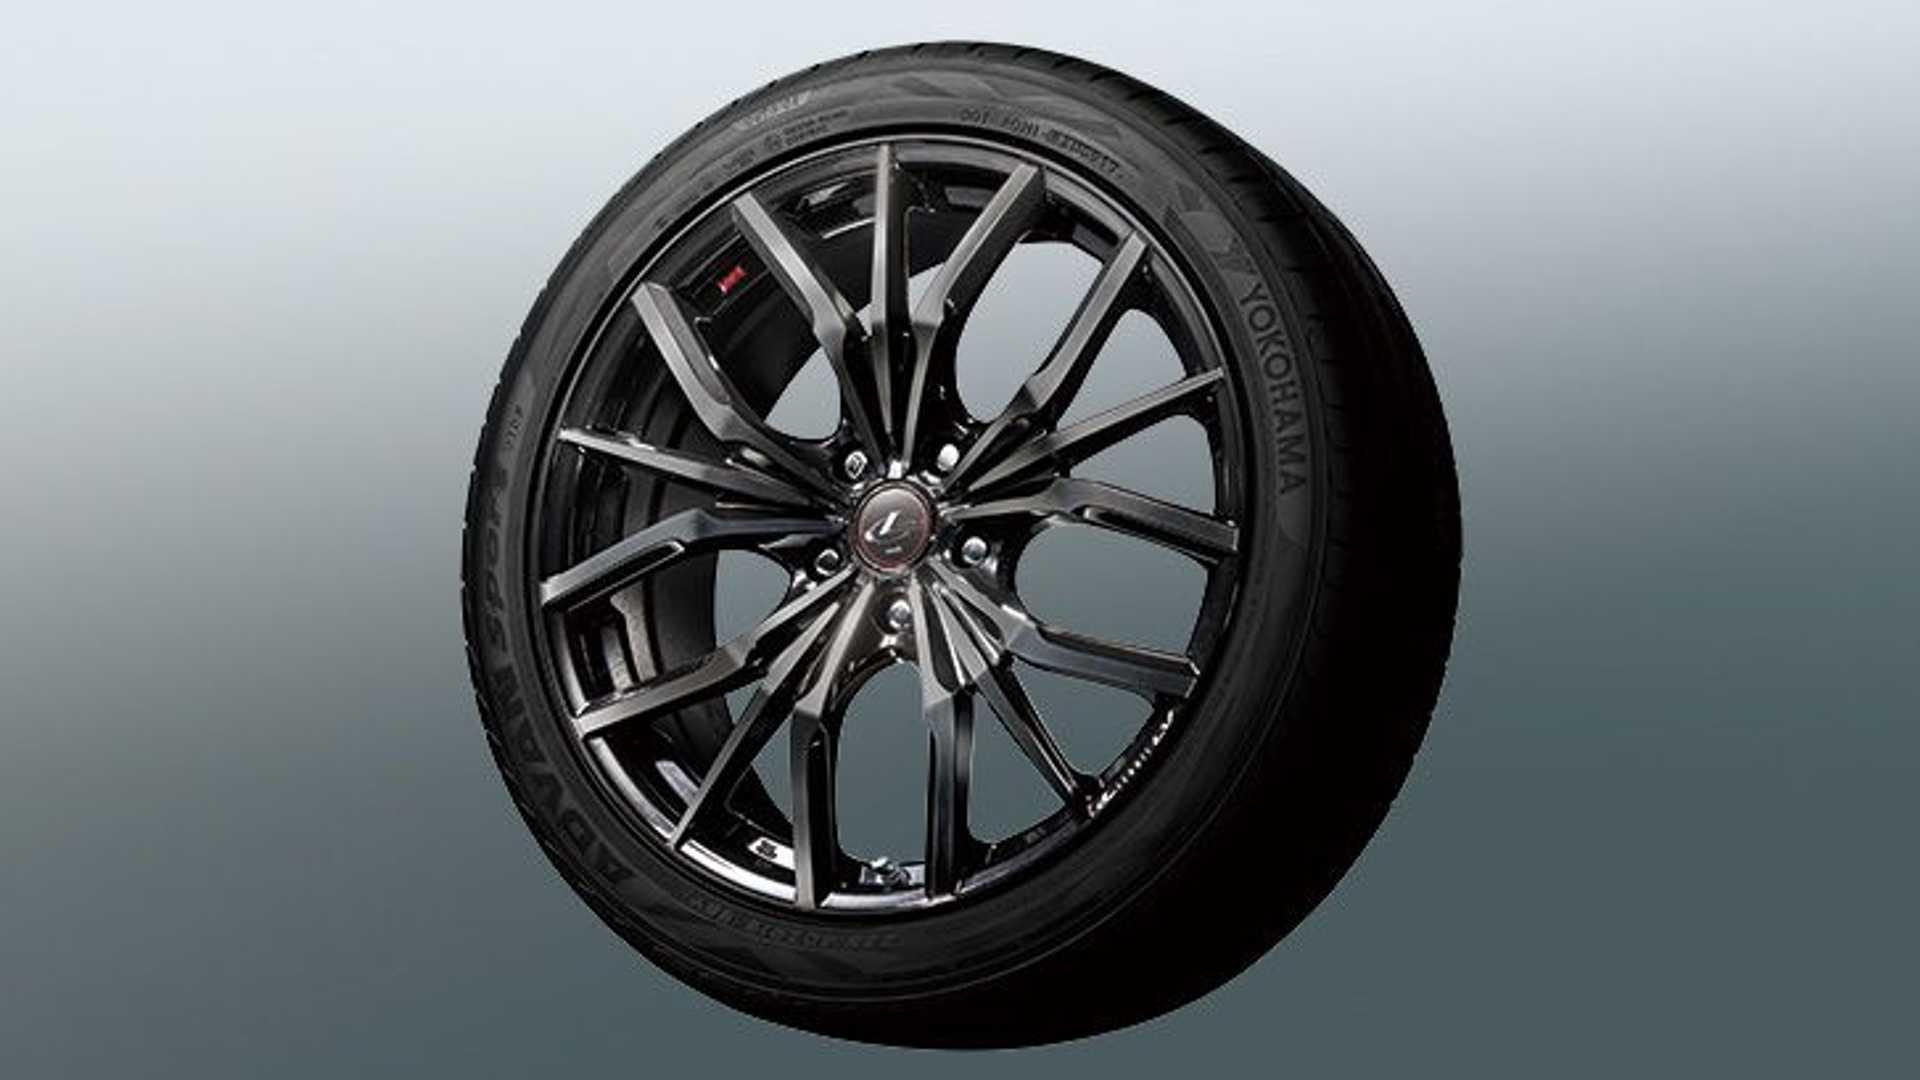 toyota-camry-modellista-wheel-19-inch